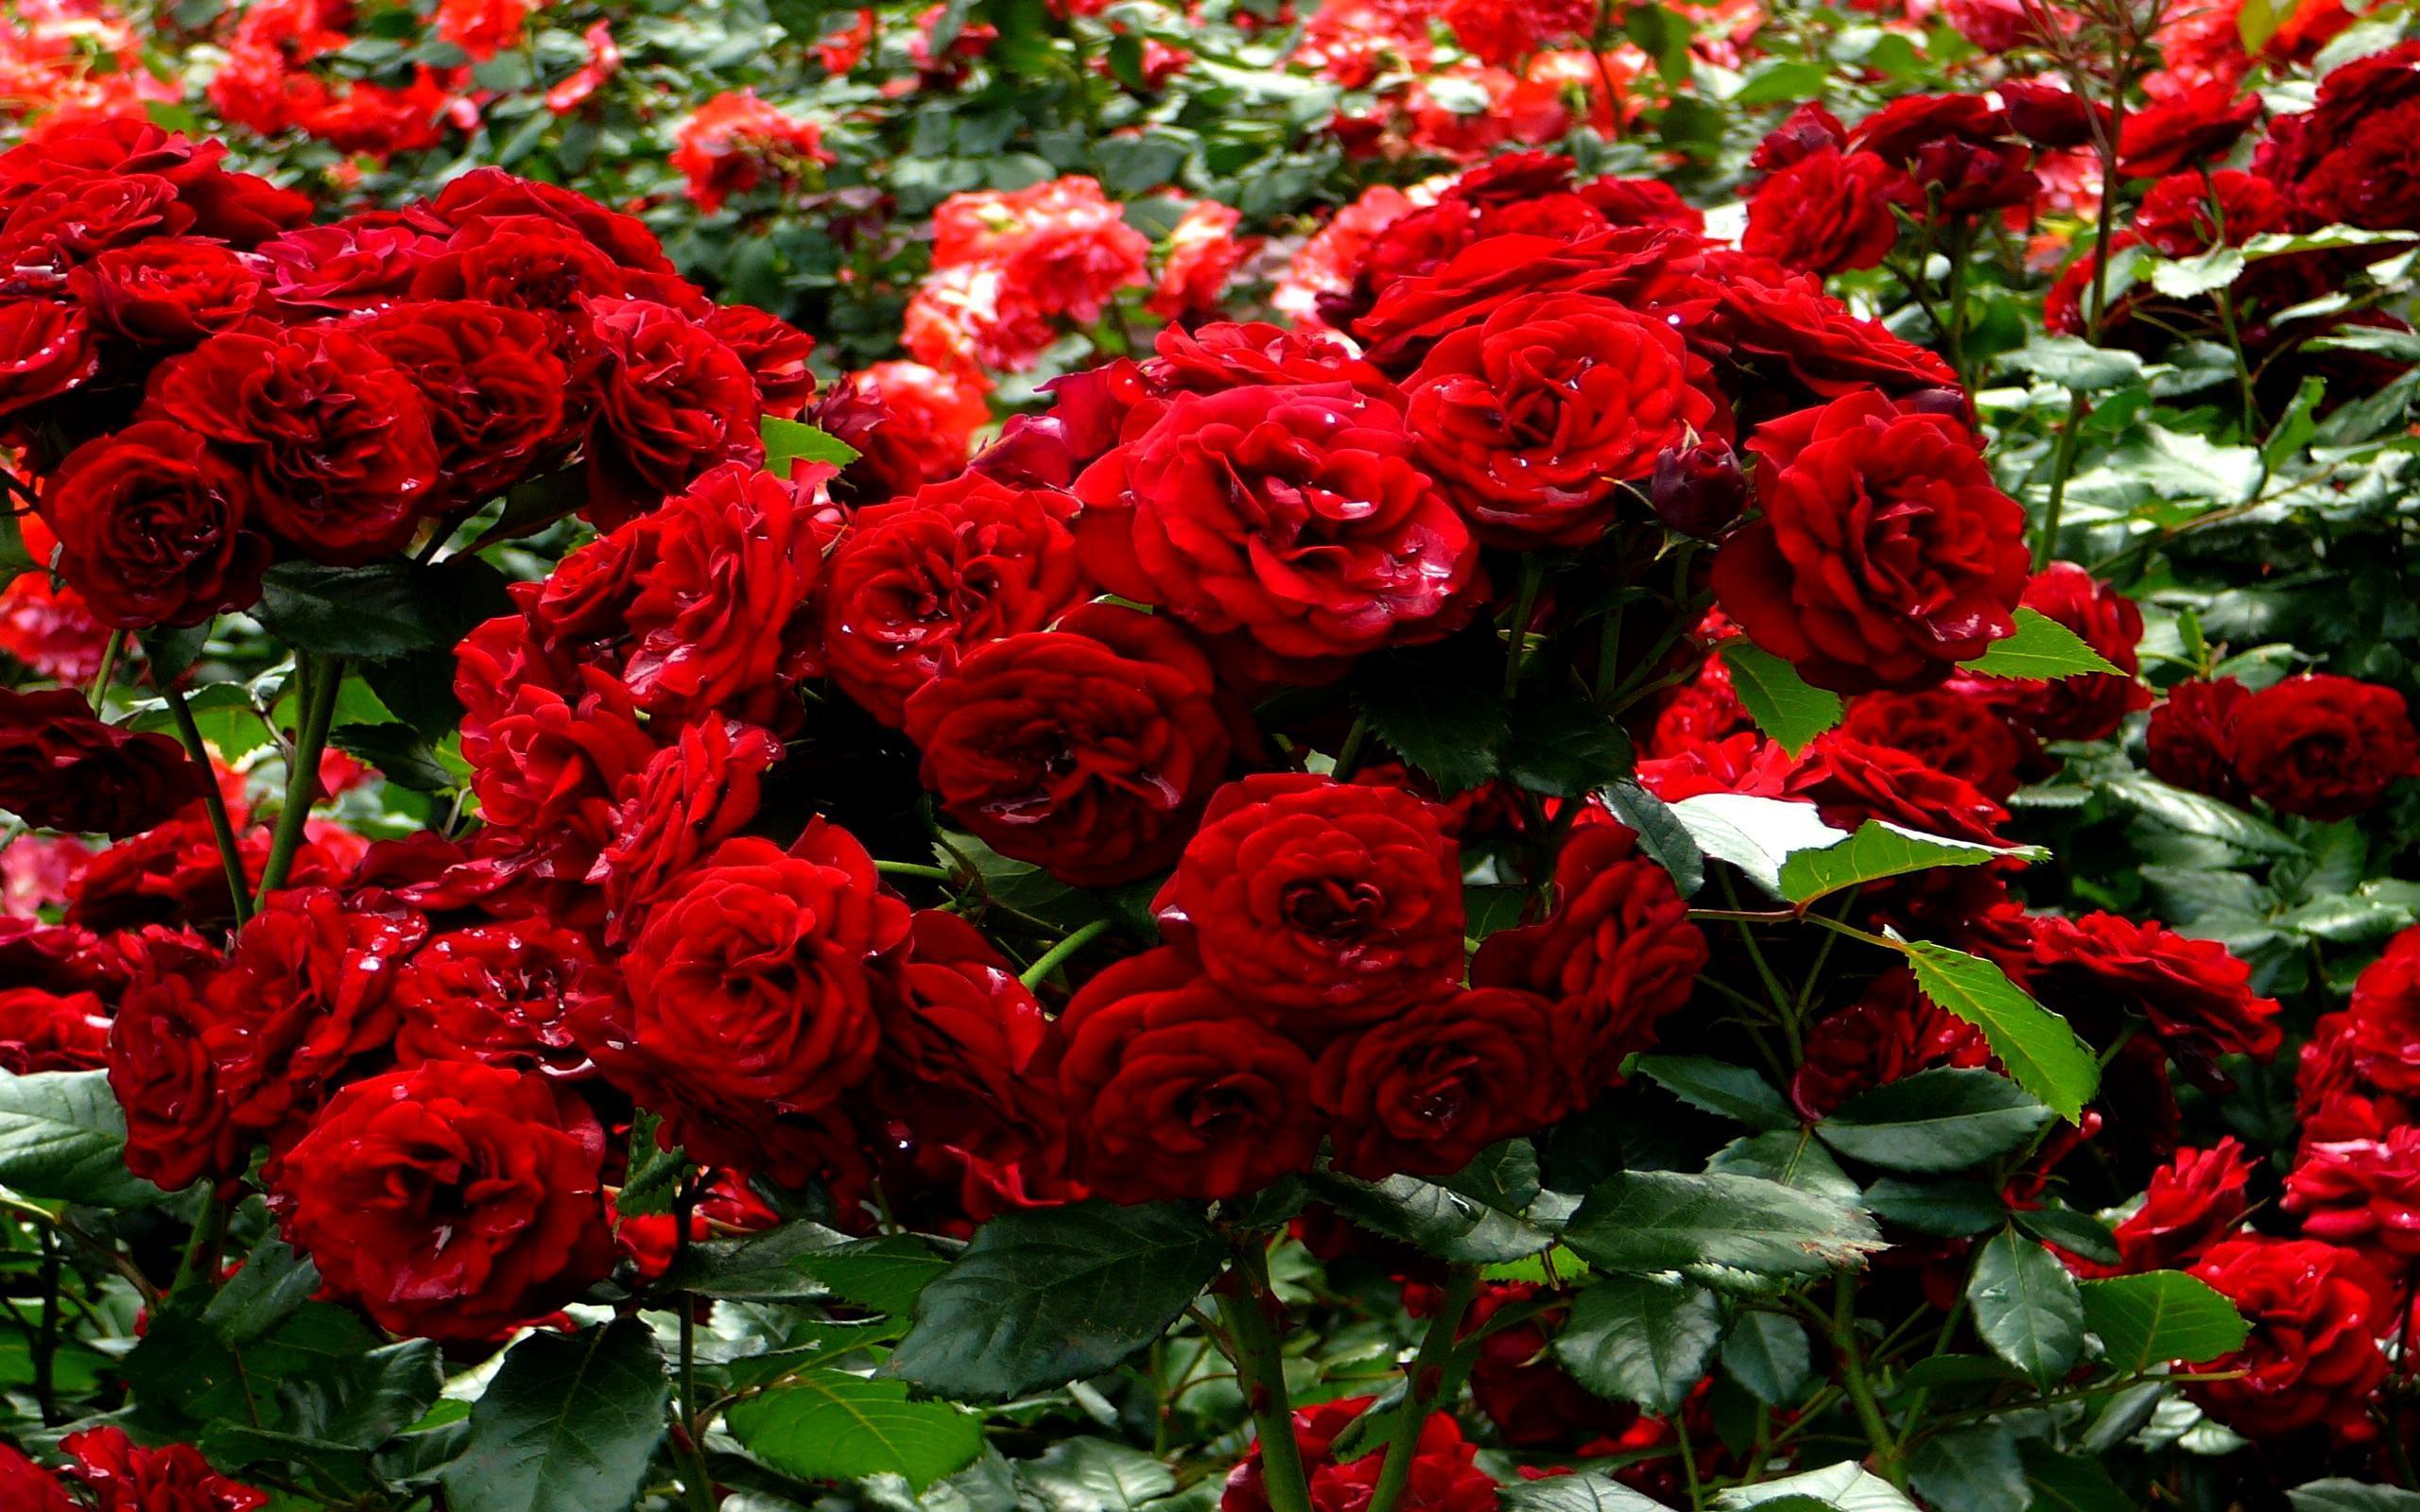 Rose Garden Wallpapers , Top Free Rose Garden Backgrounds